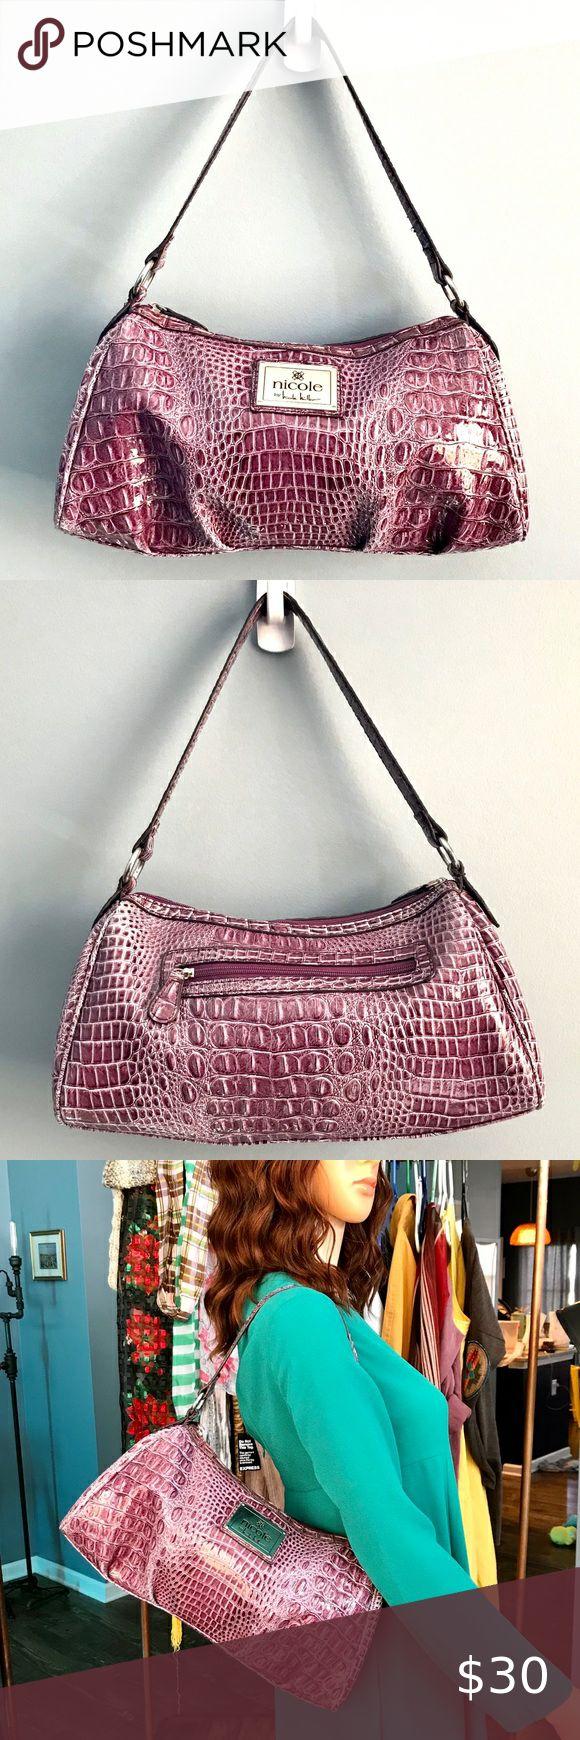 NICOLE by Nicole Miller purple embossed should bag This is